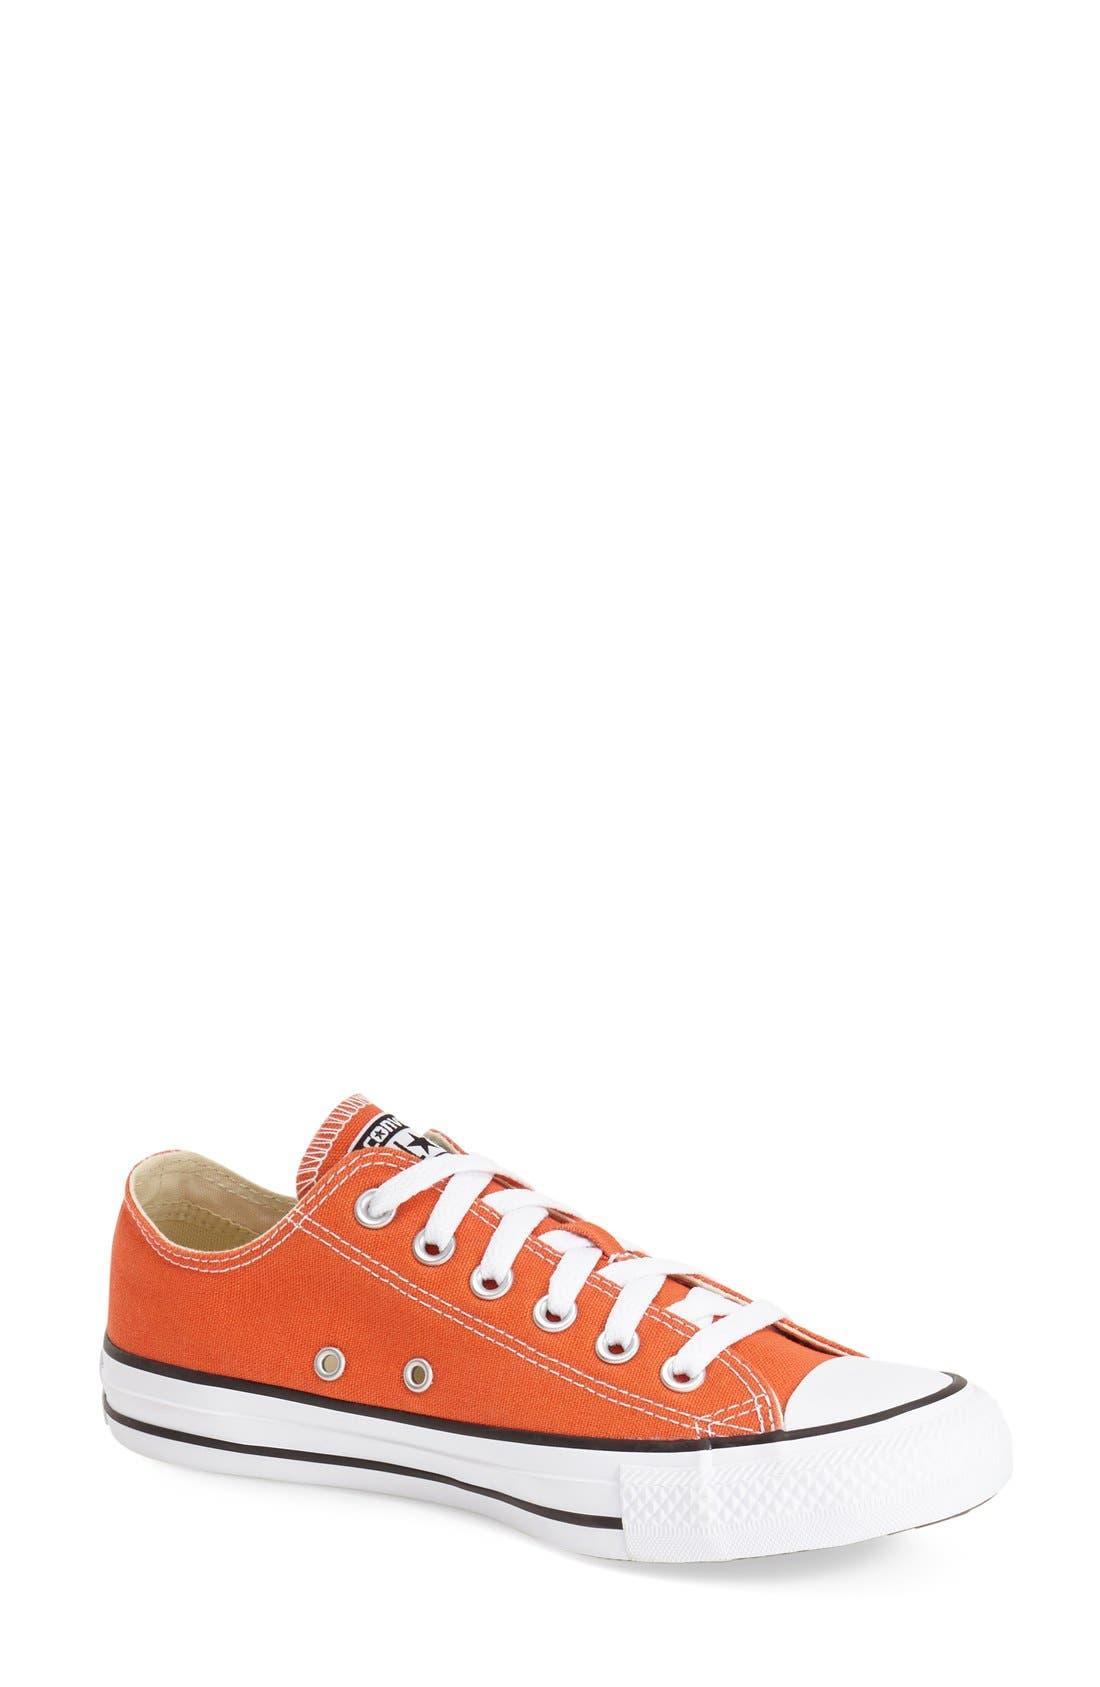 Main Image - Converse Chuck Taylor® All Star® 'Seasonal Ox' Low Top Sneaker (Women)